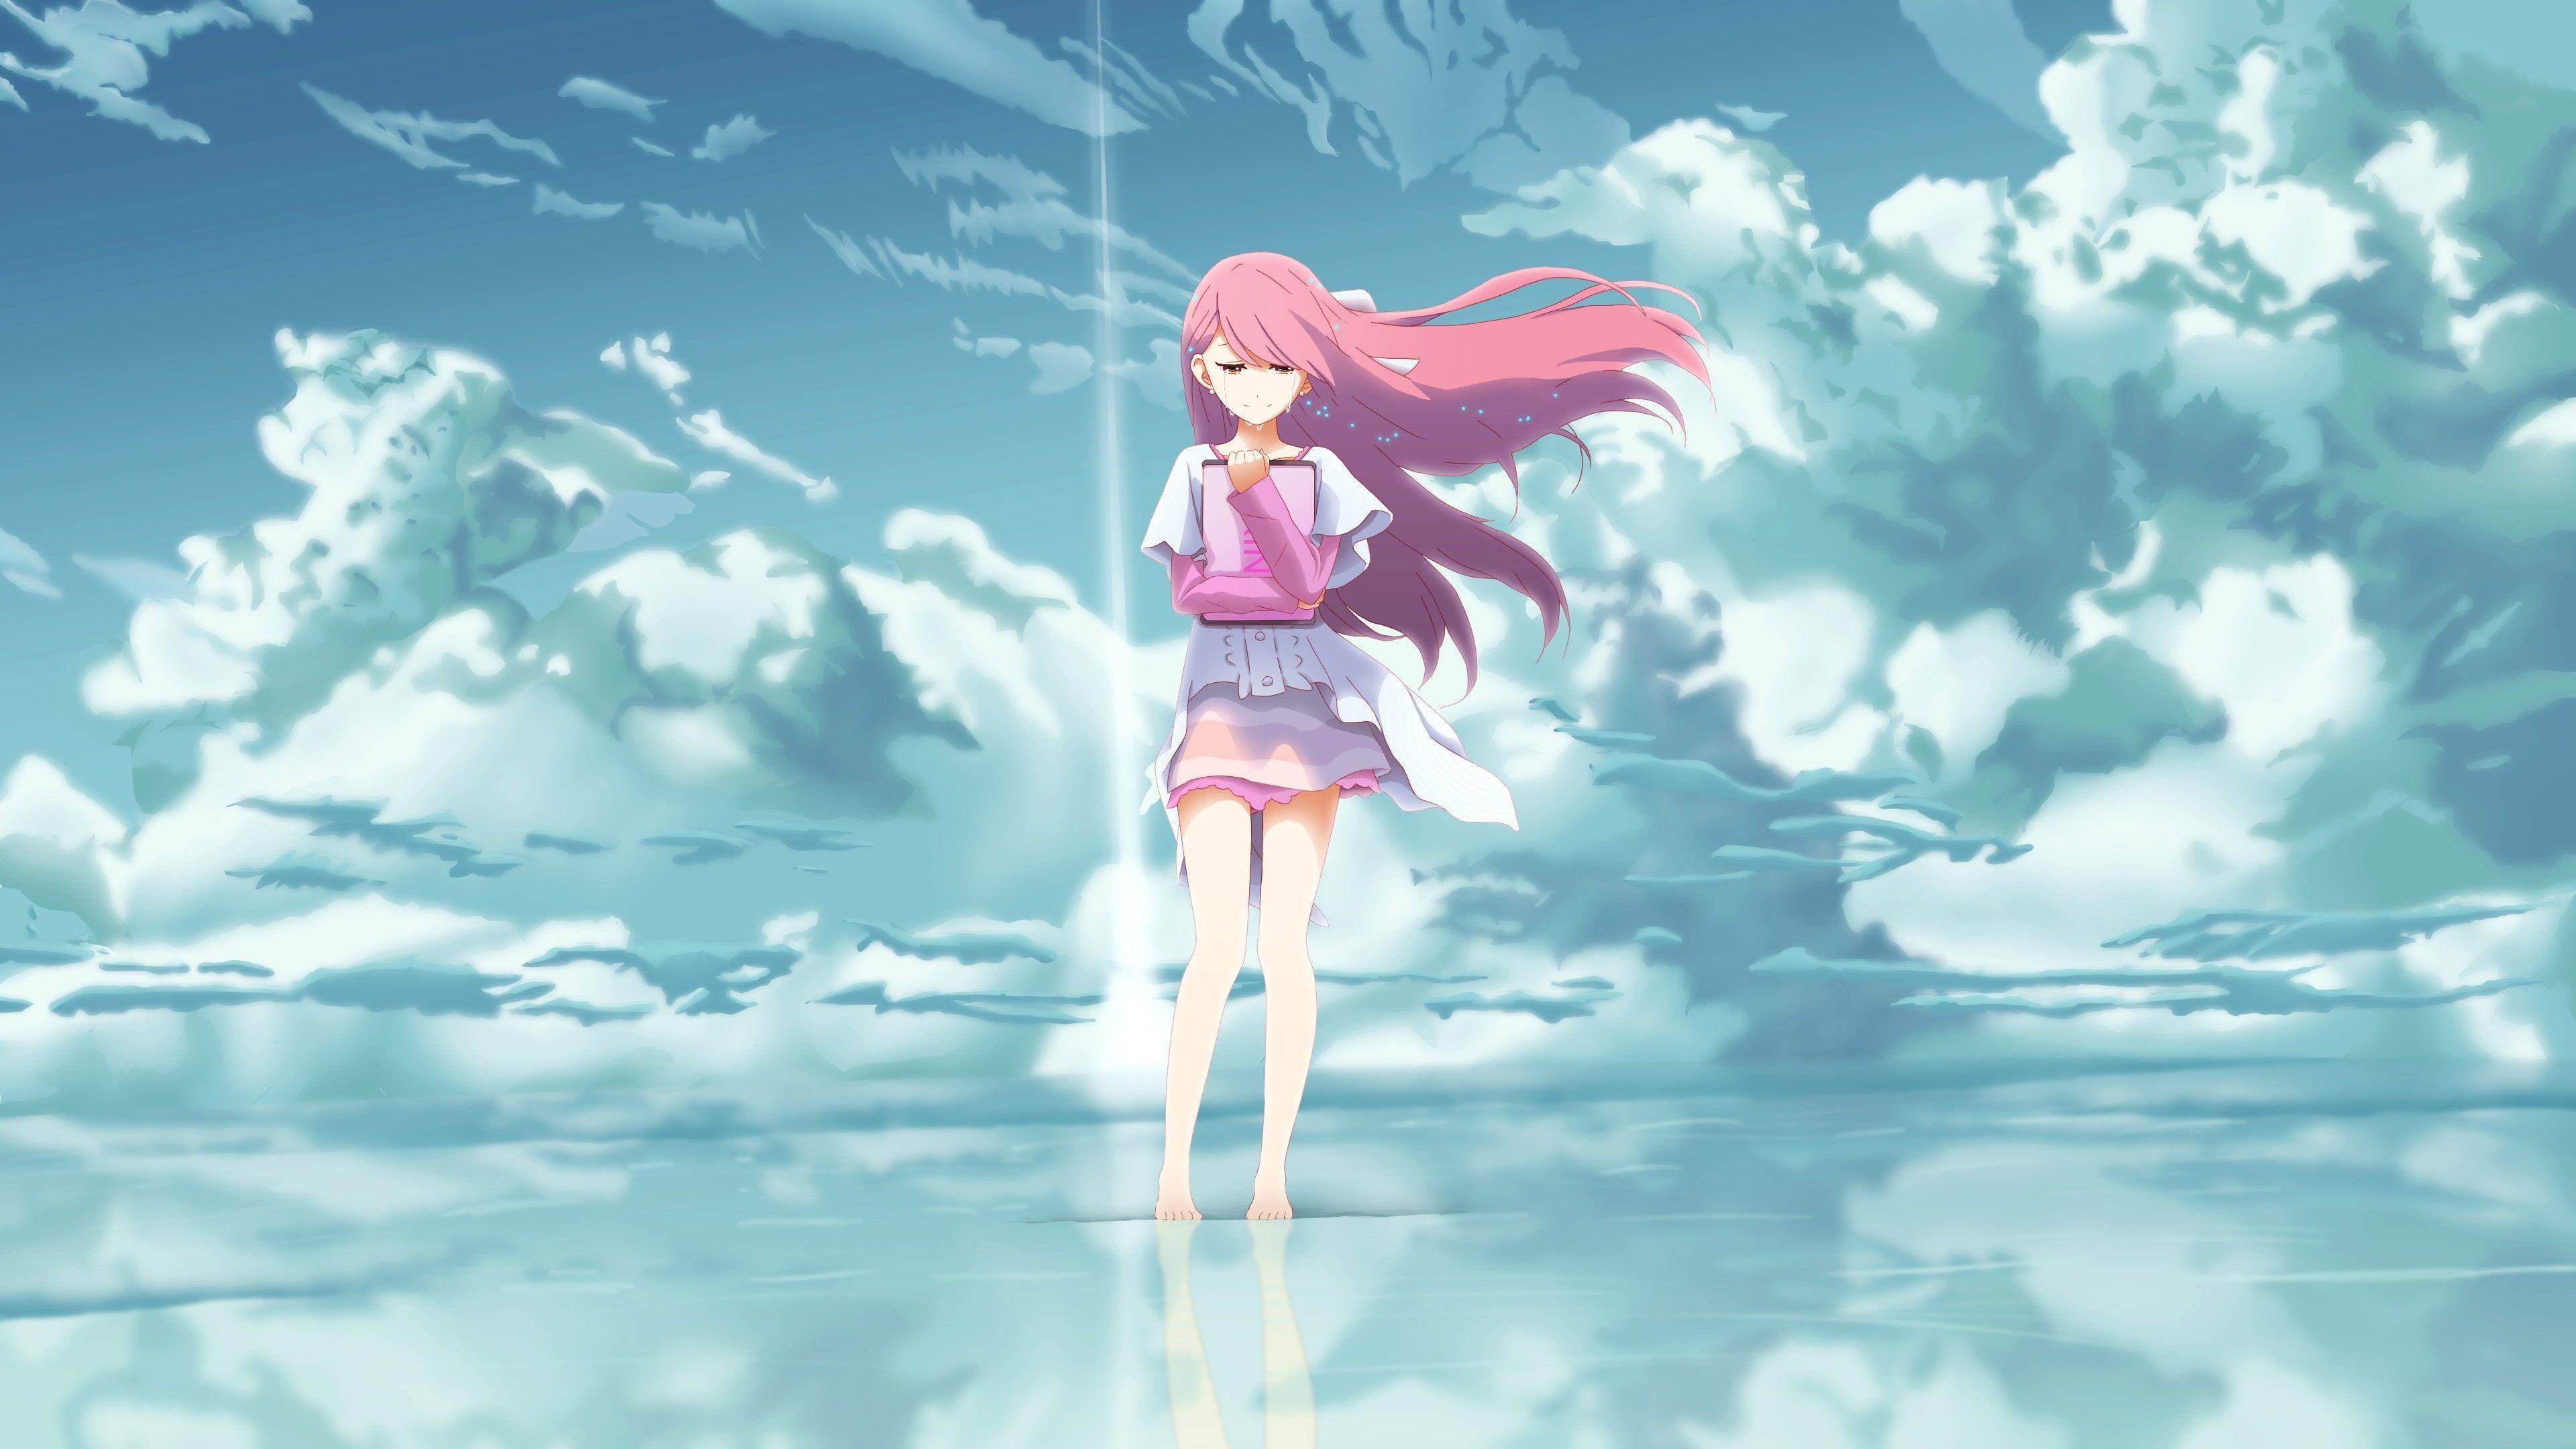 Anime Background Tumblr 1920x1080 Ikimaru.com